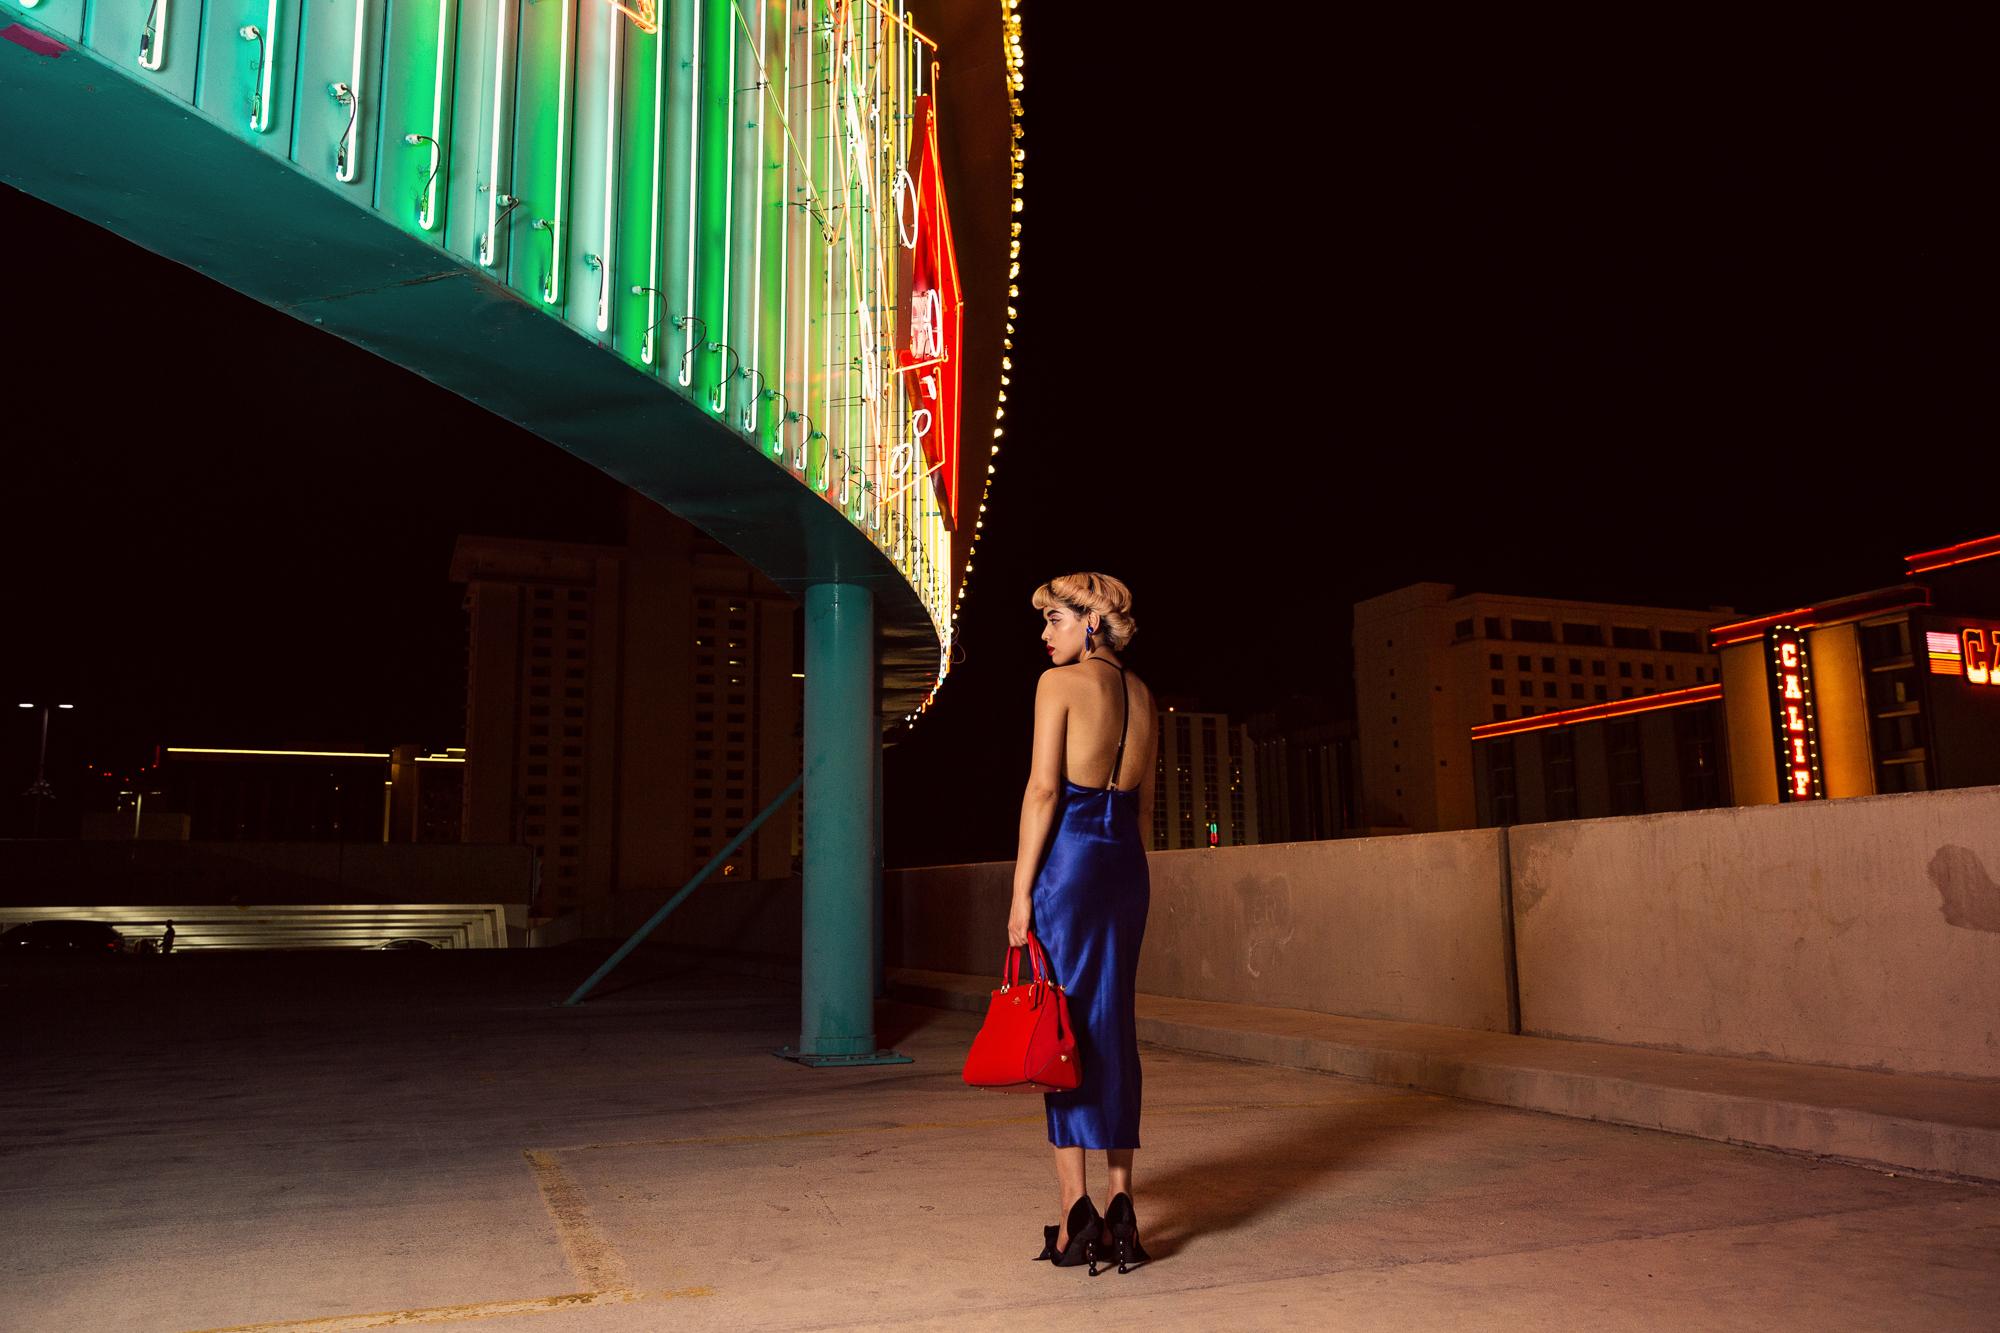 170702_NY Mag_Las Vegas_456.jpg